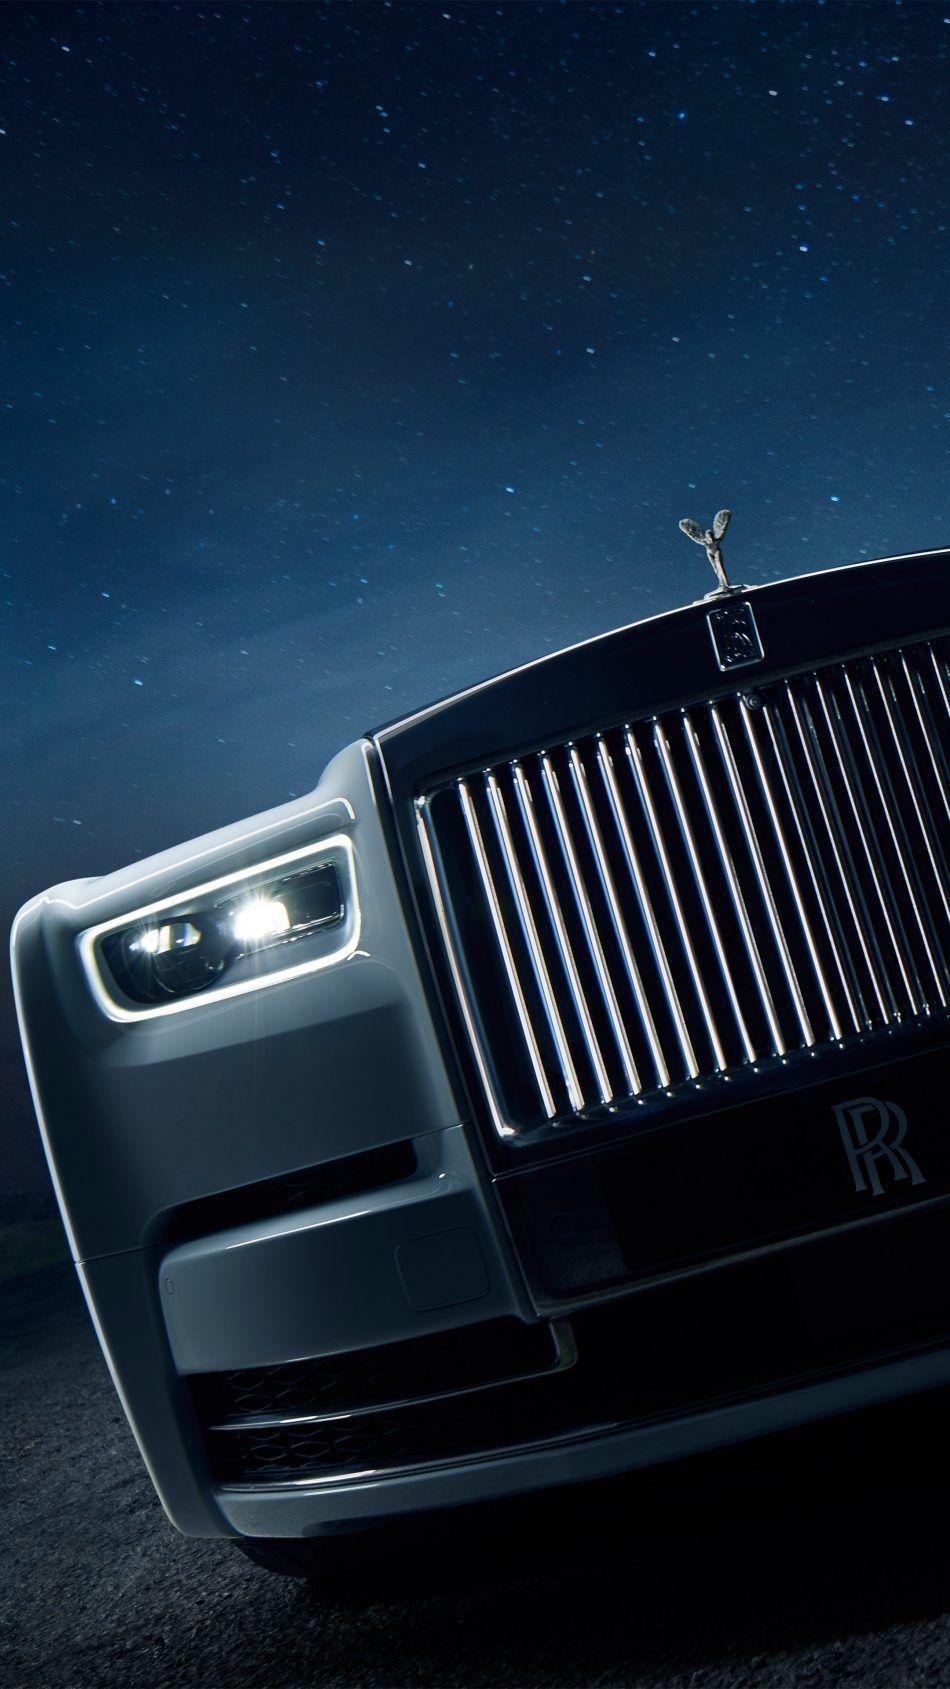 Rolls Royce Logo Hd Mobile Wallpapers Wallpaper Cave